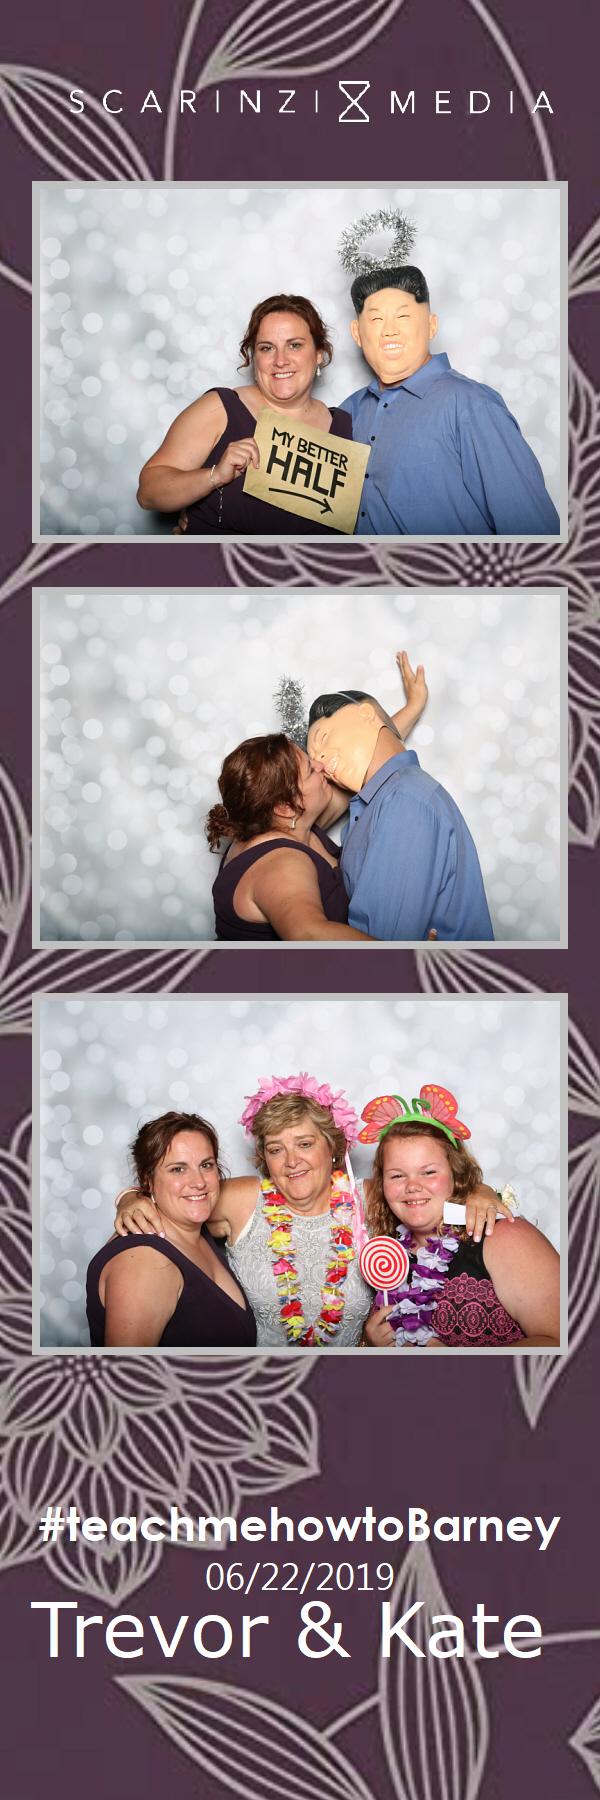 2019.06.22 - Barney Wedding PHOTOBOOTH67.jpg